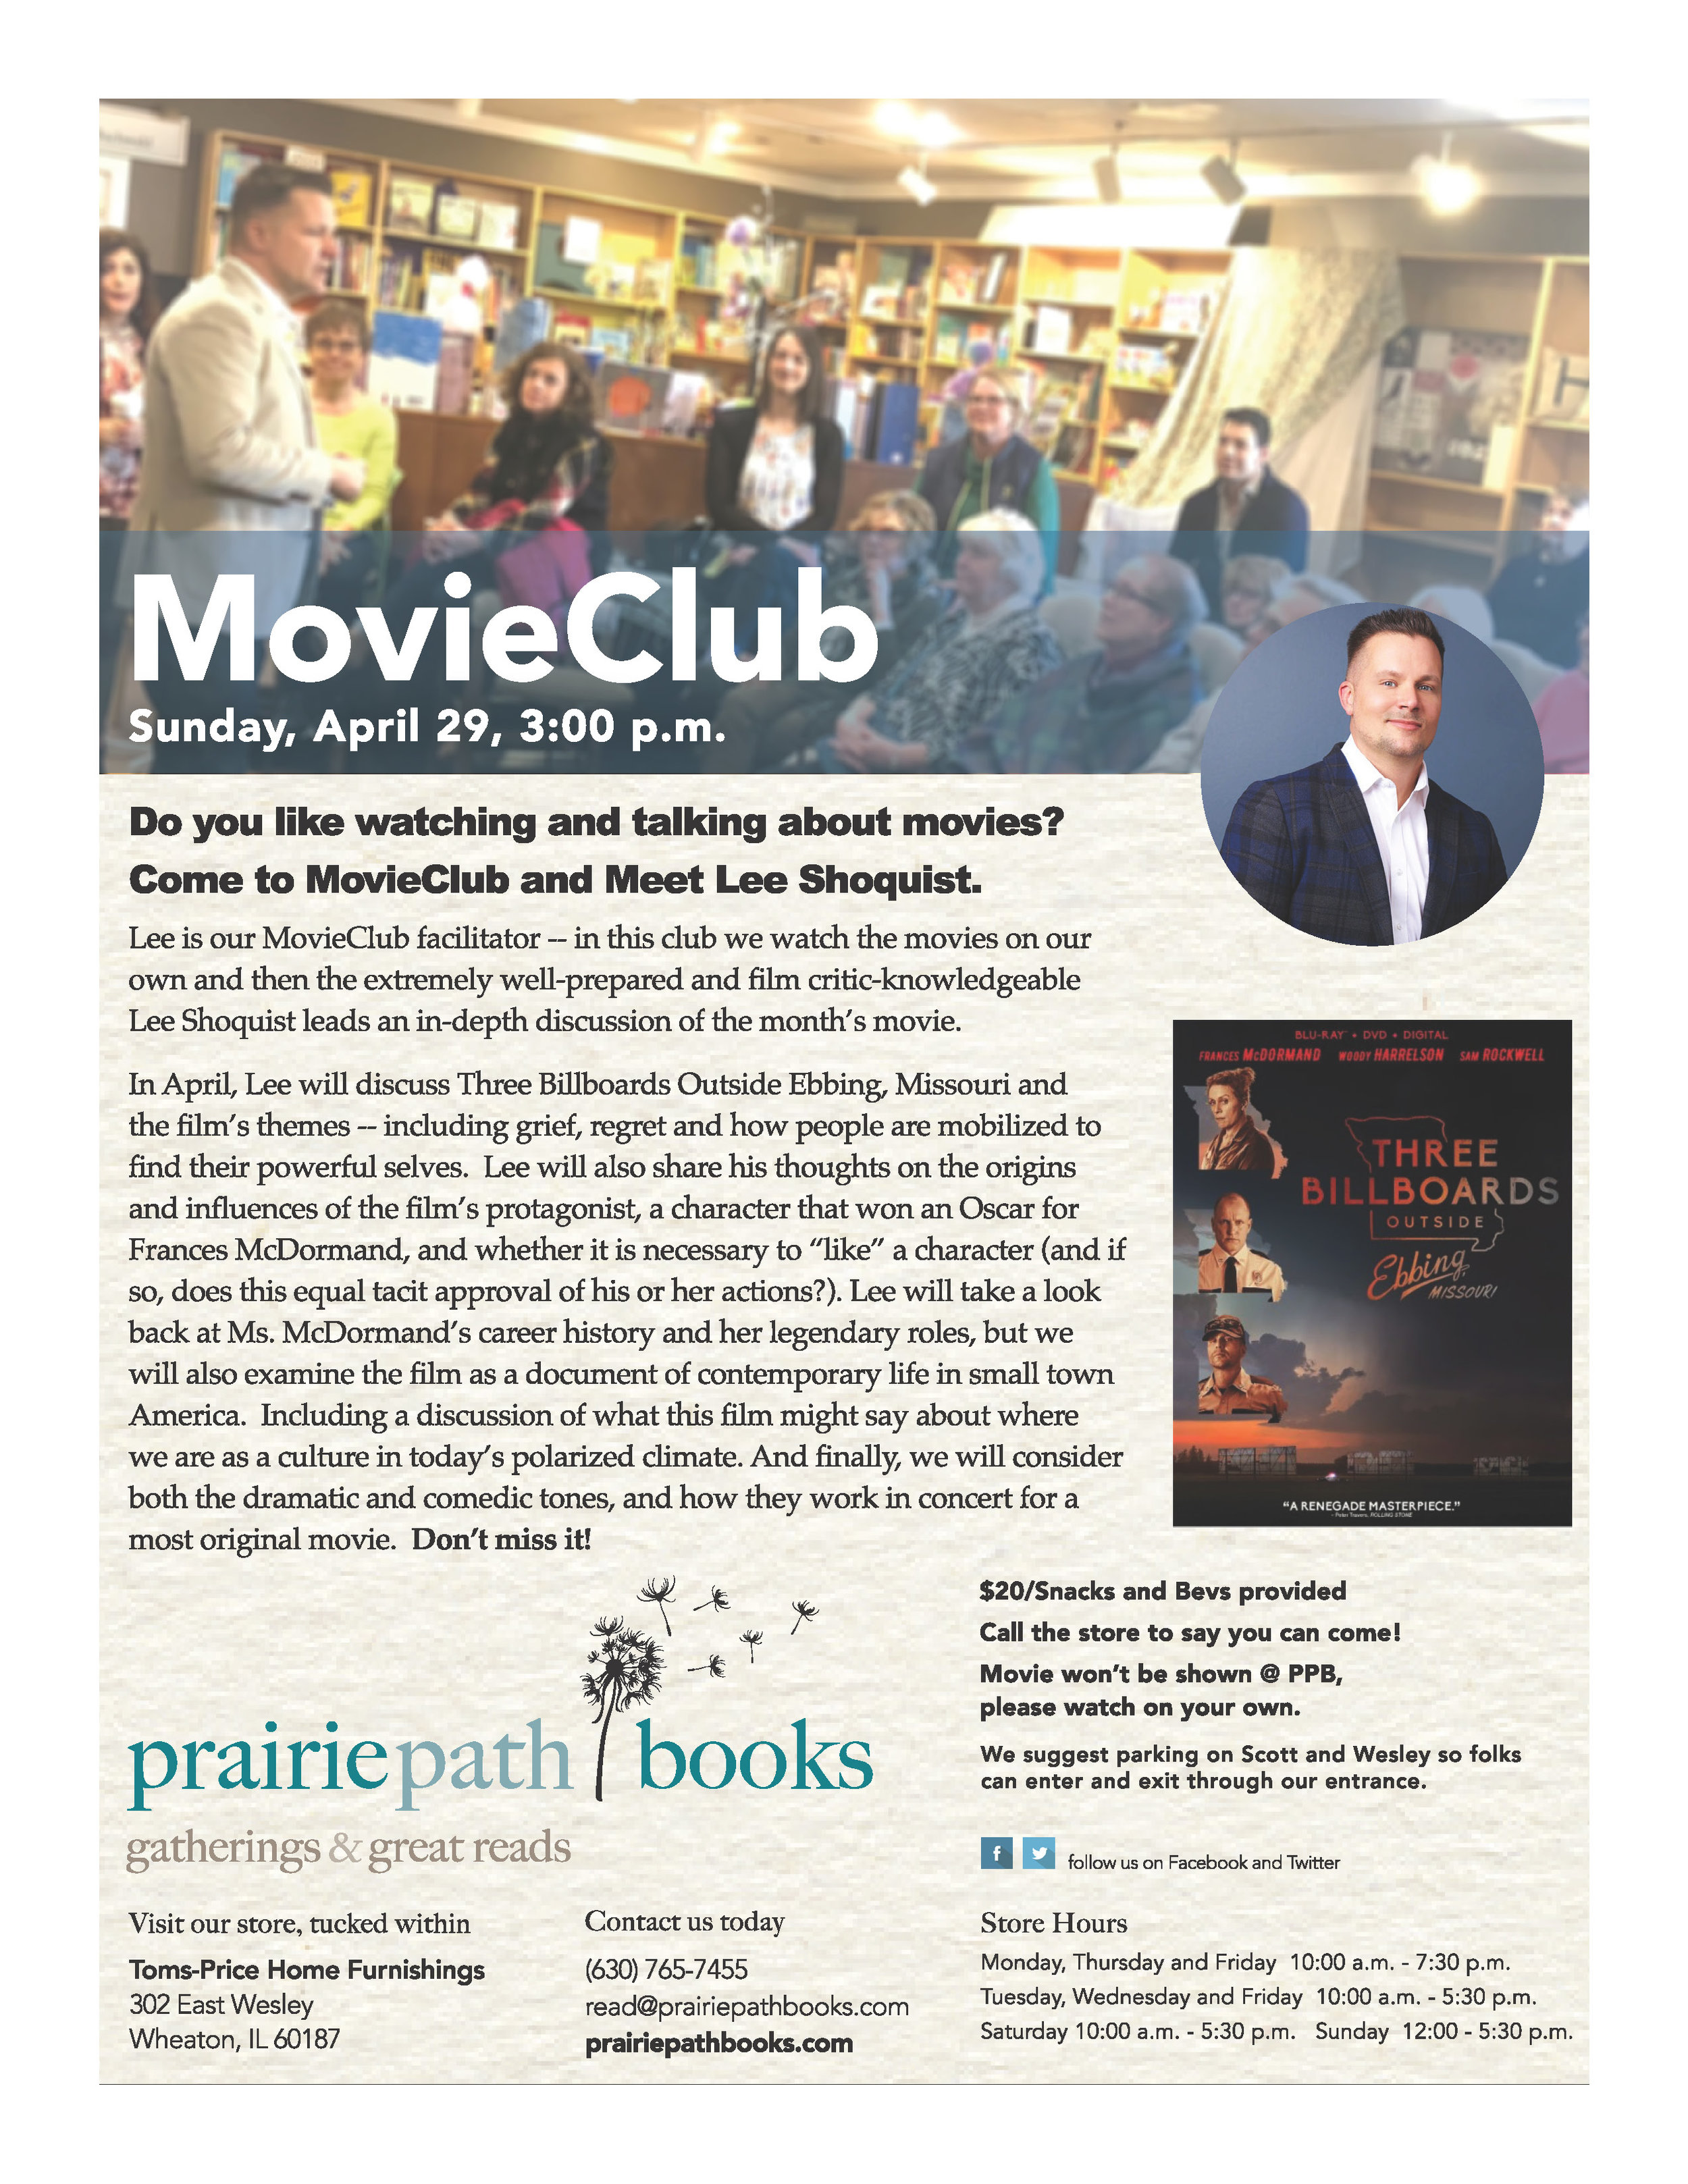 MovieClub_April29.jpg